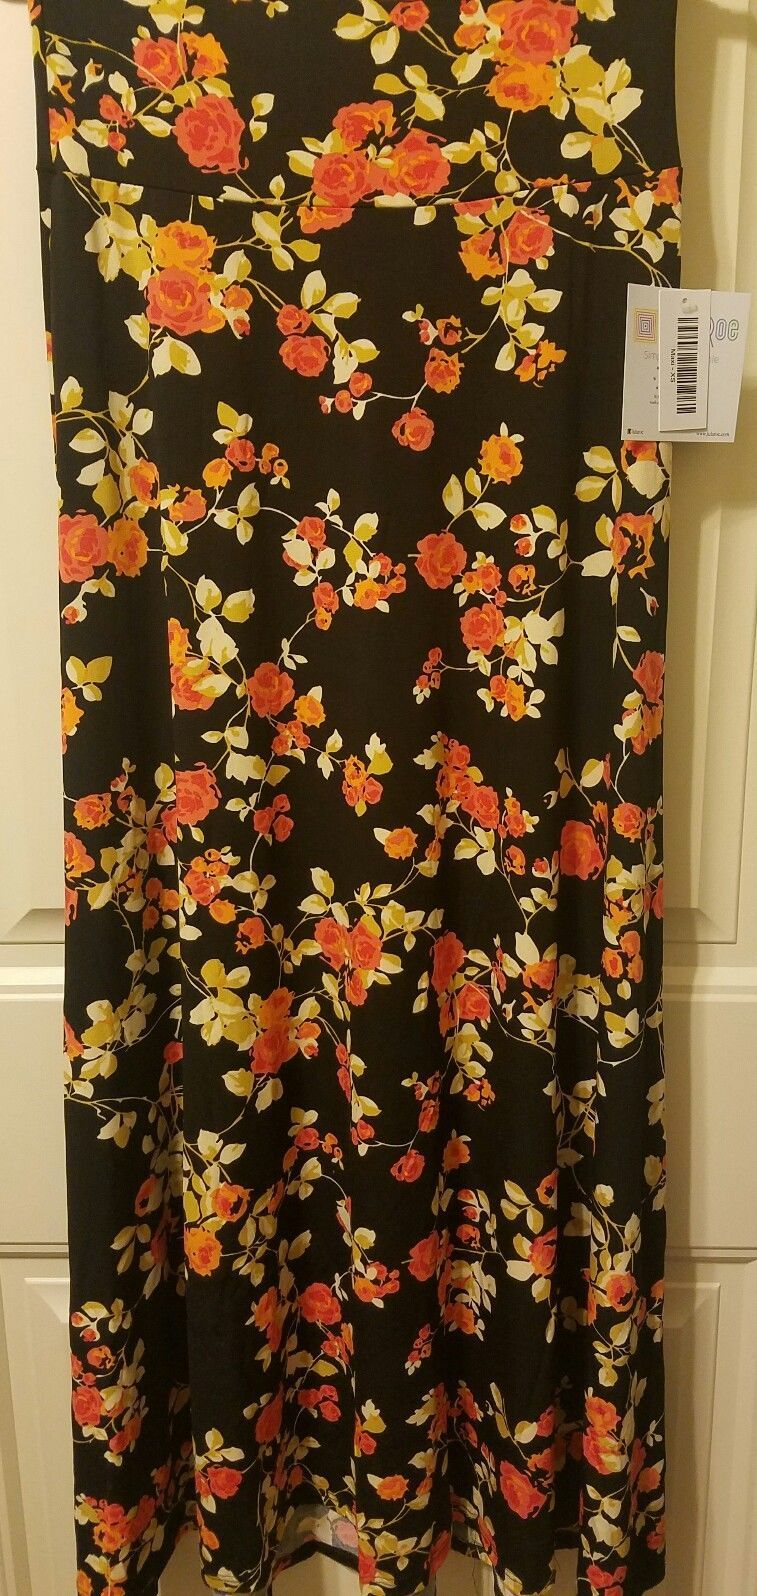 Lularoe Maxi Skirt Dress Xs Black W Orange Cream Yellow Flowers Floral Nwt Maxi Skirt Dress Lularoe Maxi Skirt Lularoe Maxi [ 1596 x 757 Pixel ]